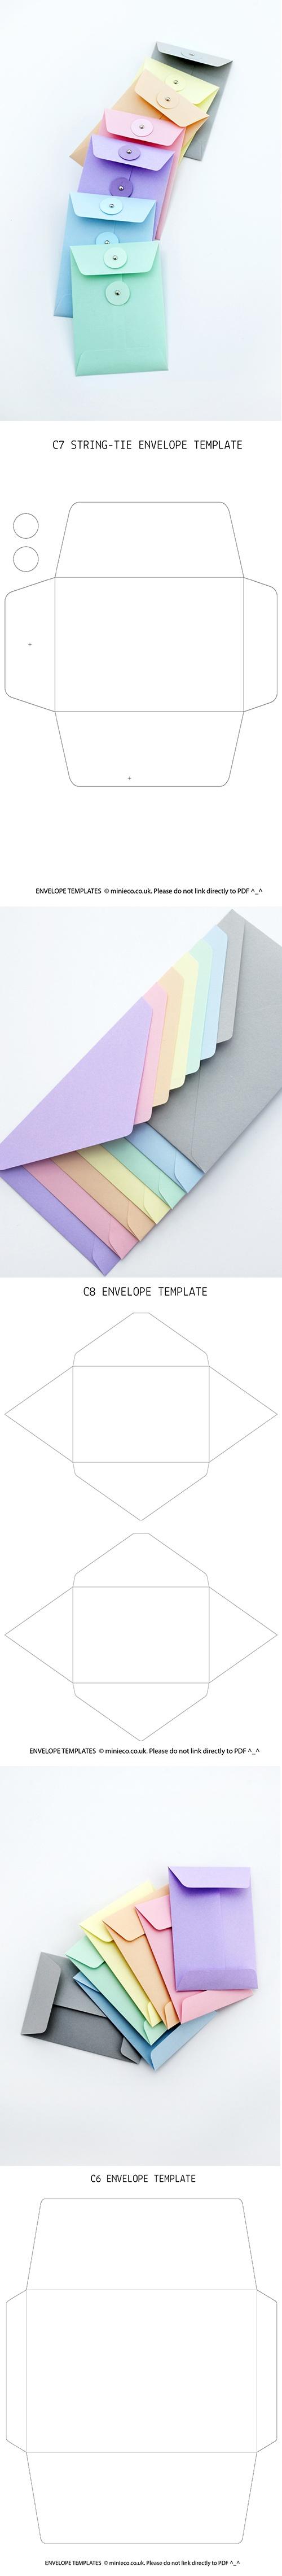 14 Best Envelope Templates Images On Pinterest Envelopes